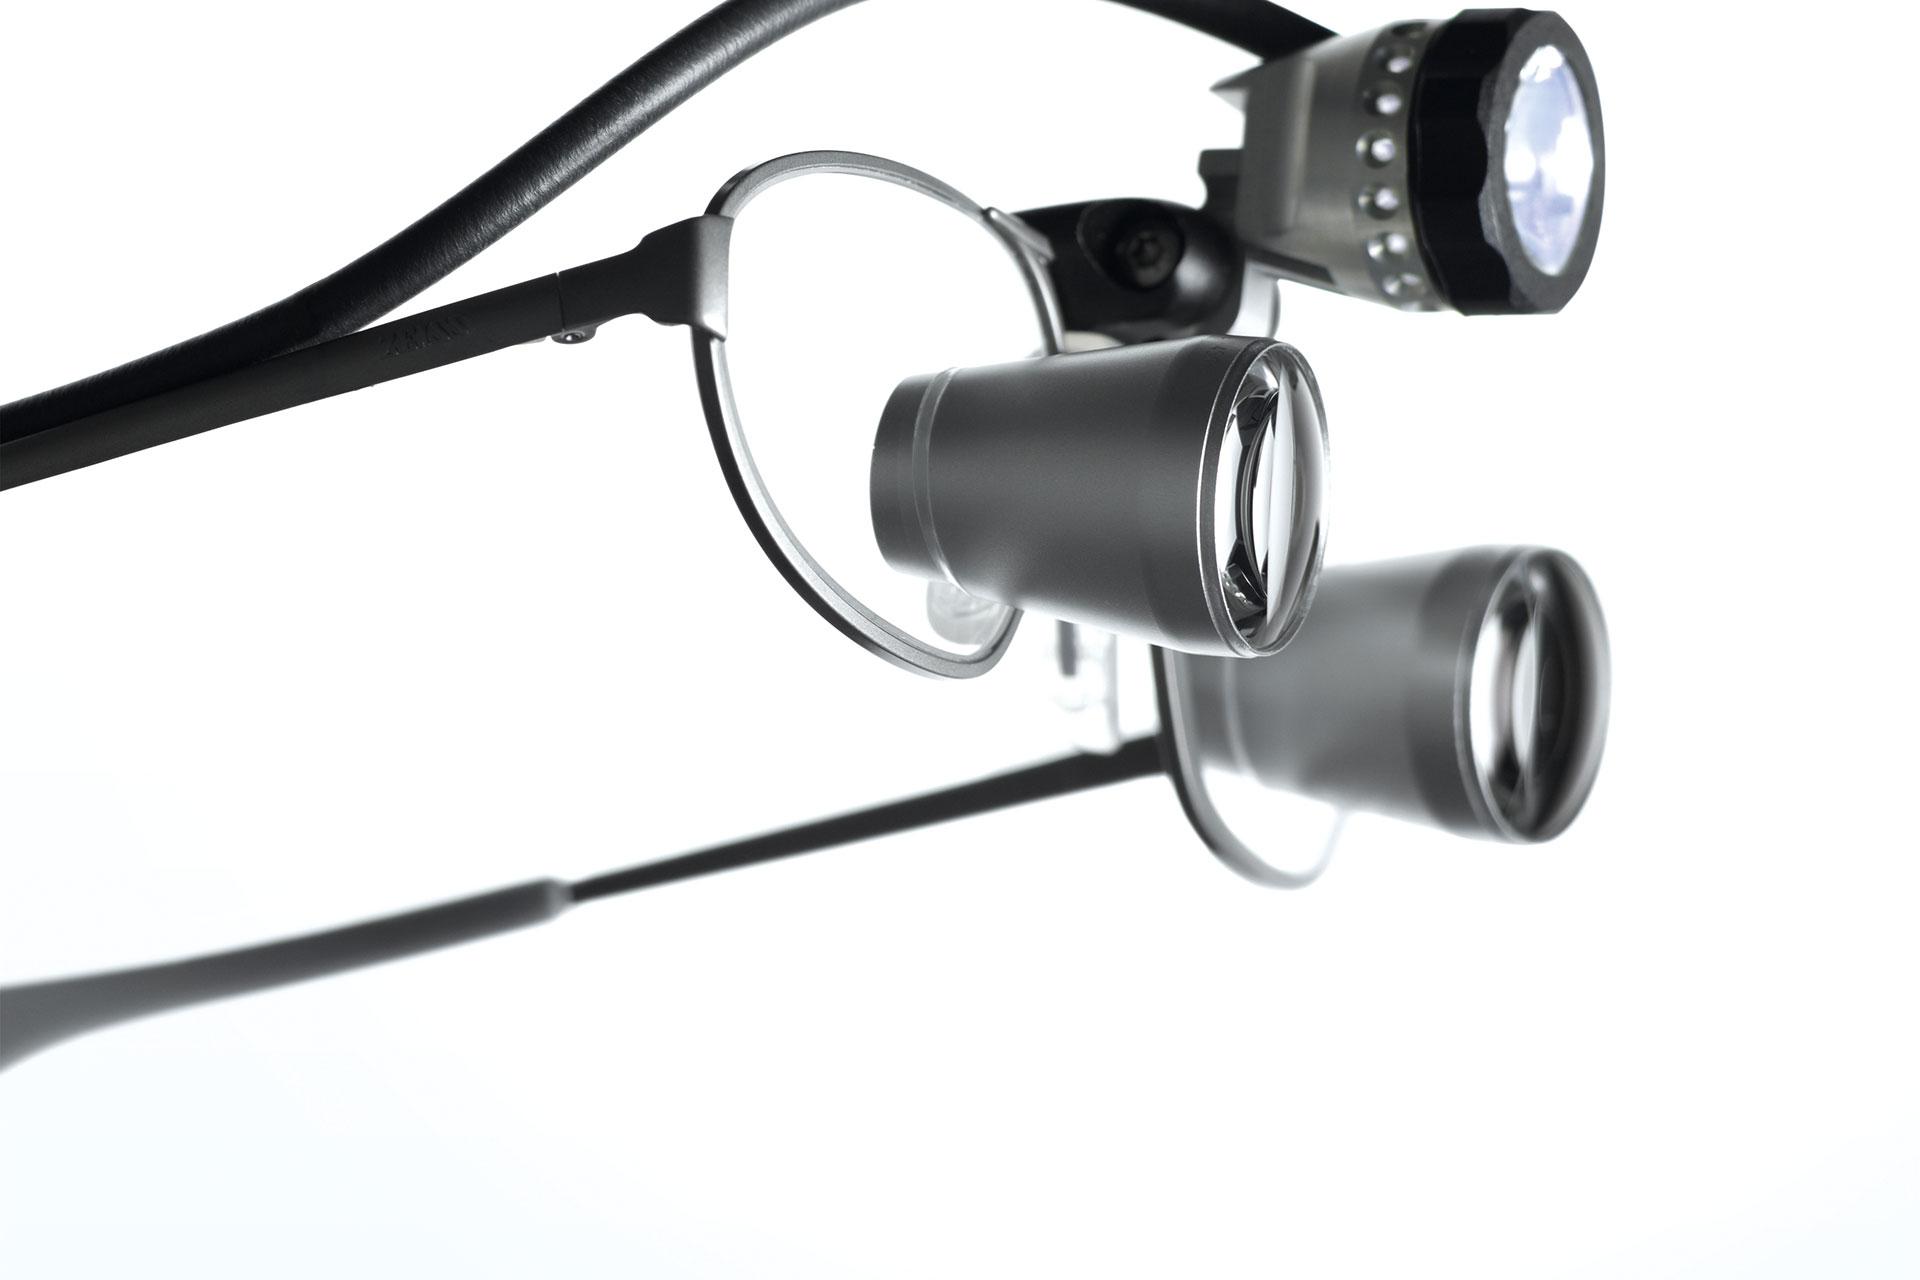 Ochelari de marire 16x, lentile cu lupa incorporata, unisex